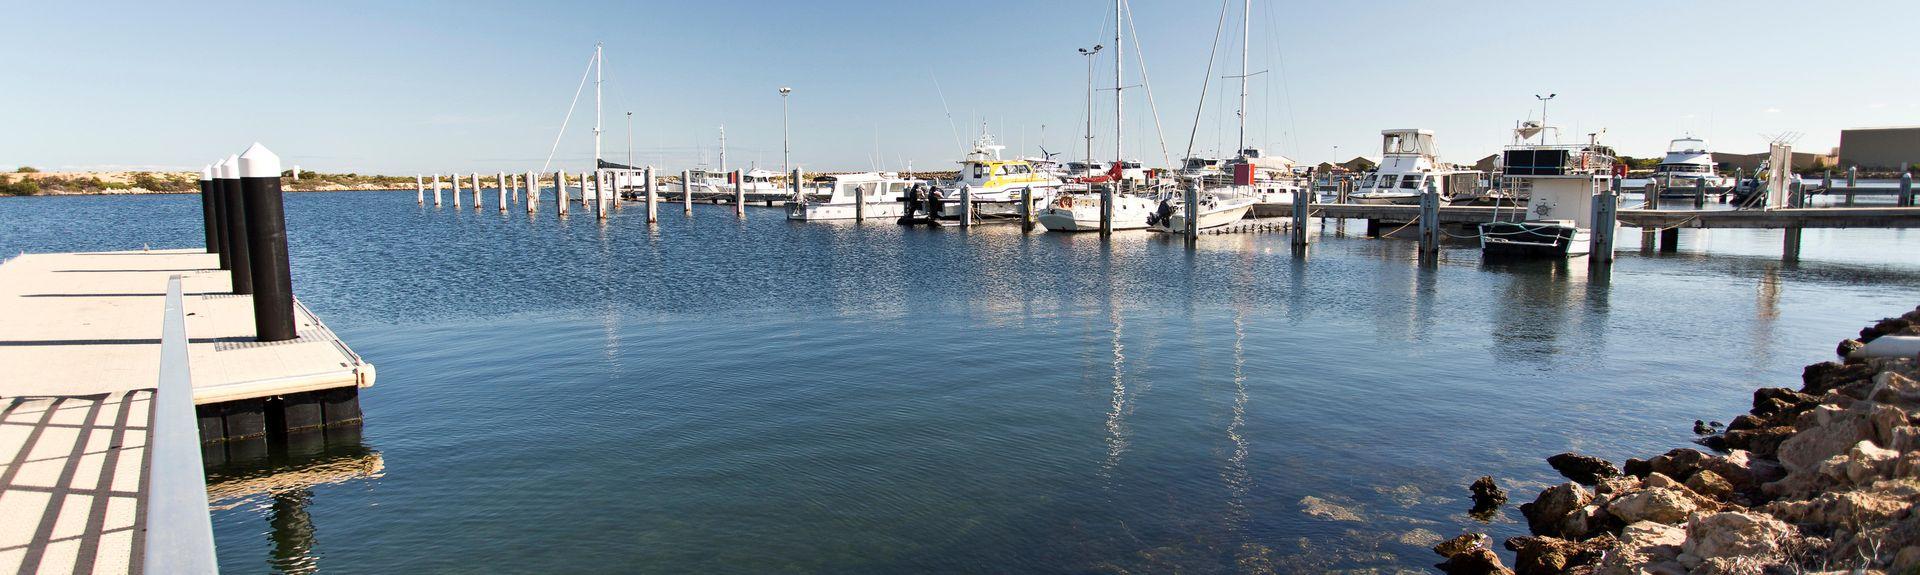 Jurien Bay WA, Australia